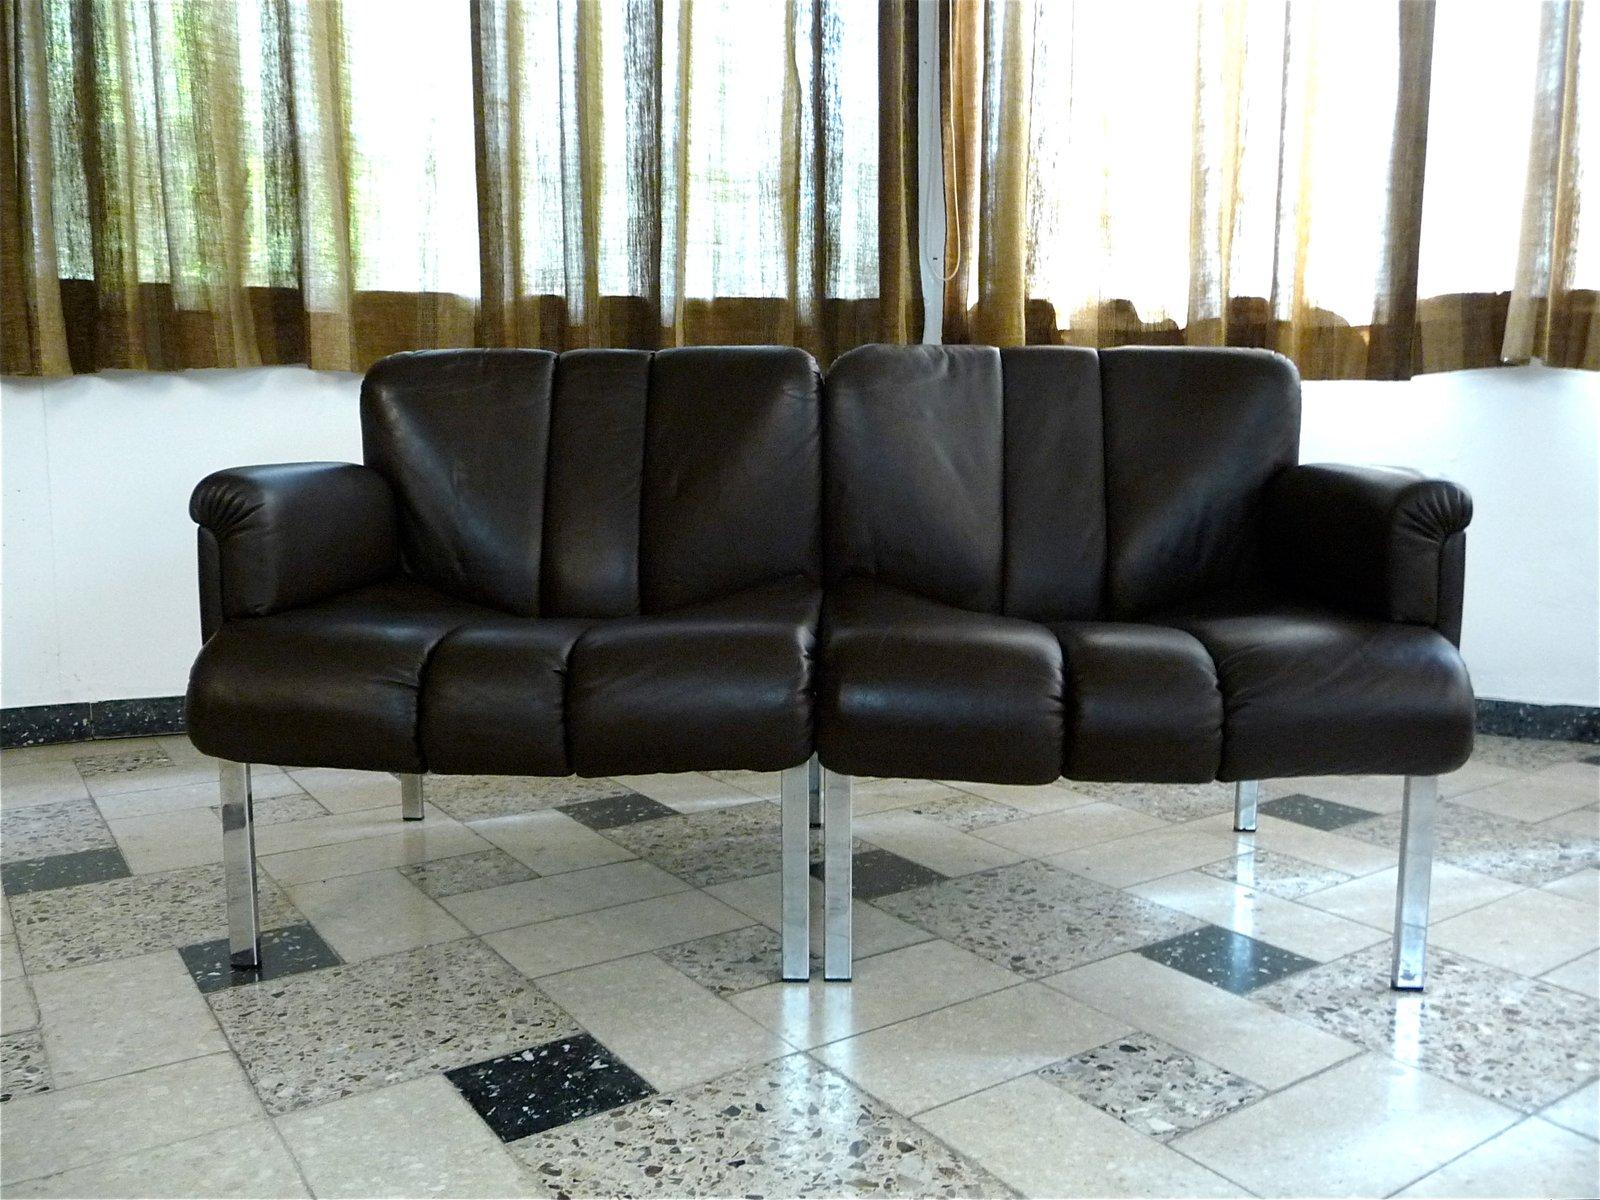 dunkelbraunes eurochair ledersofa von girsberger 1970er bei pamono kaufen. Black Bedroom Furniture Sets. Home Design Ideas